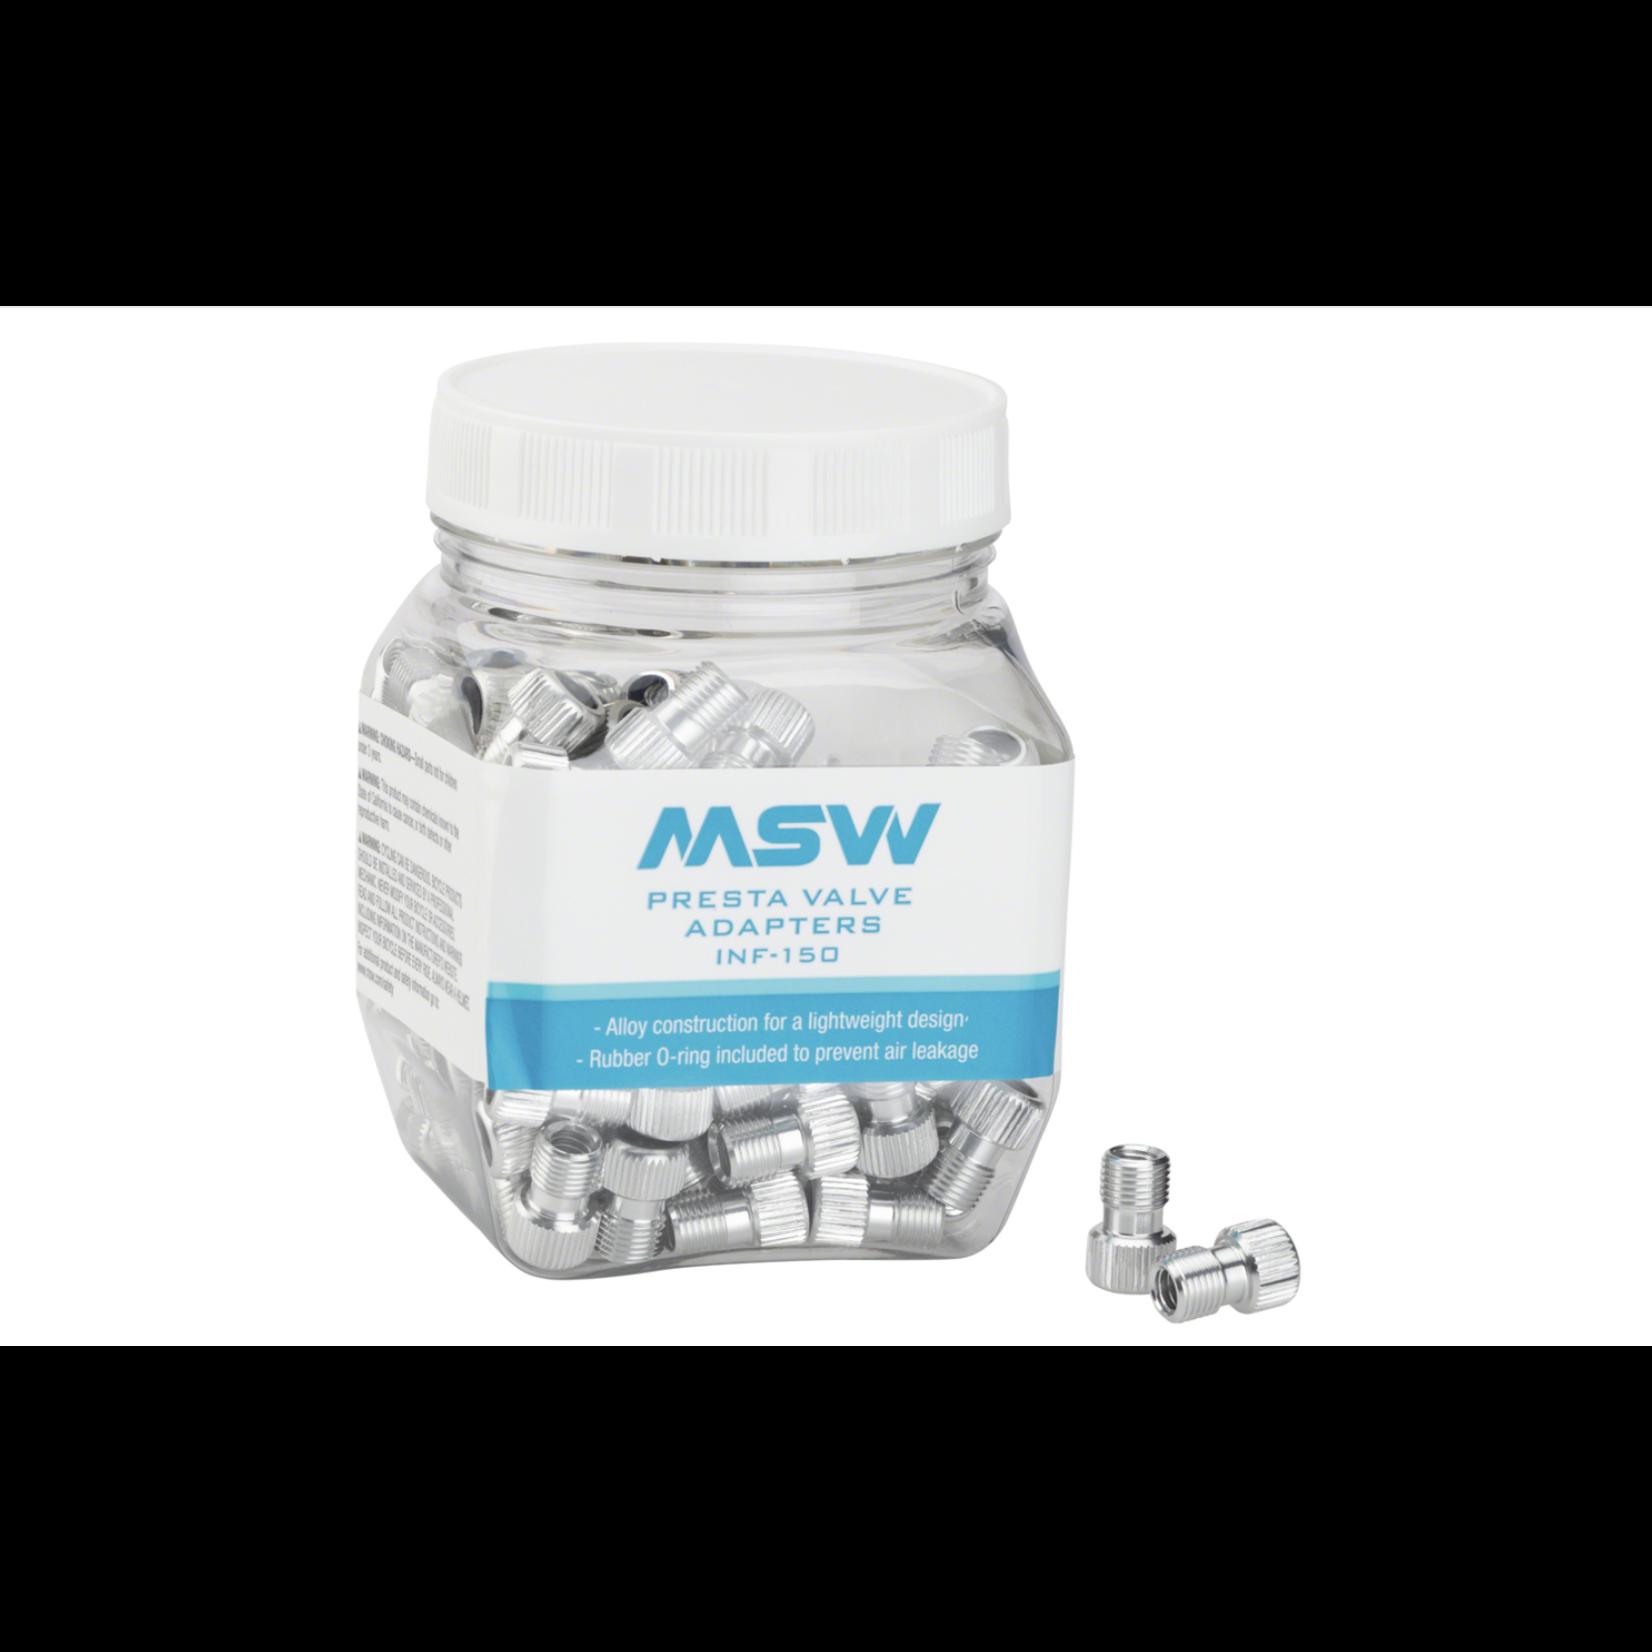 MSW PRESTA VALVE ADAPTERS  PU3350